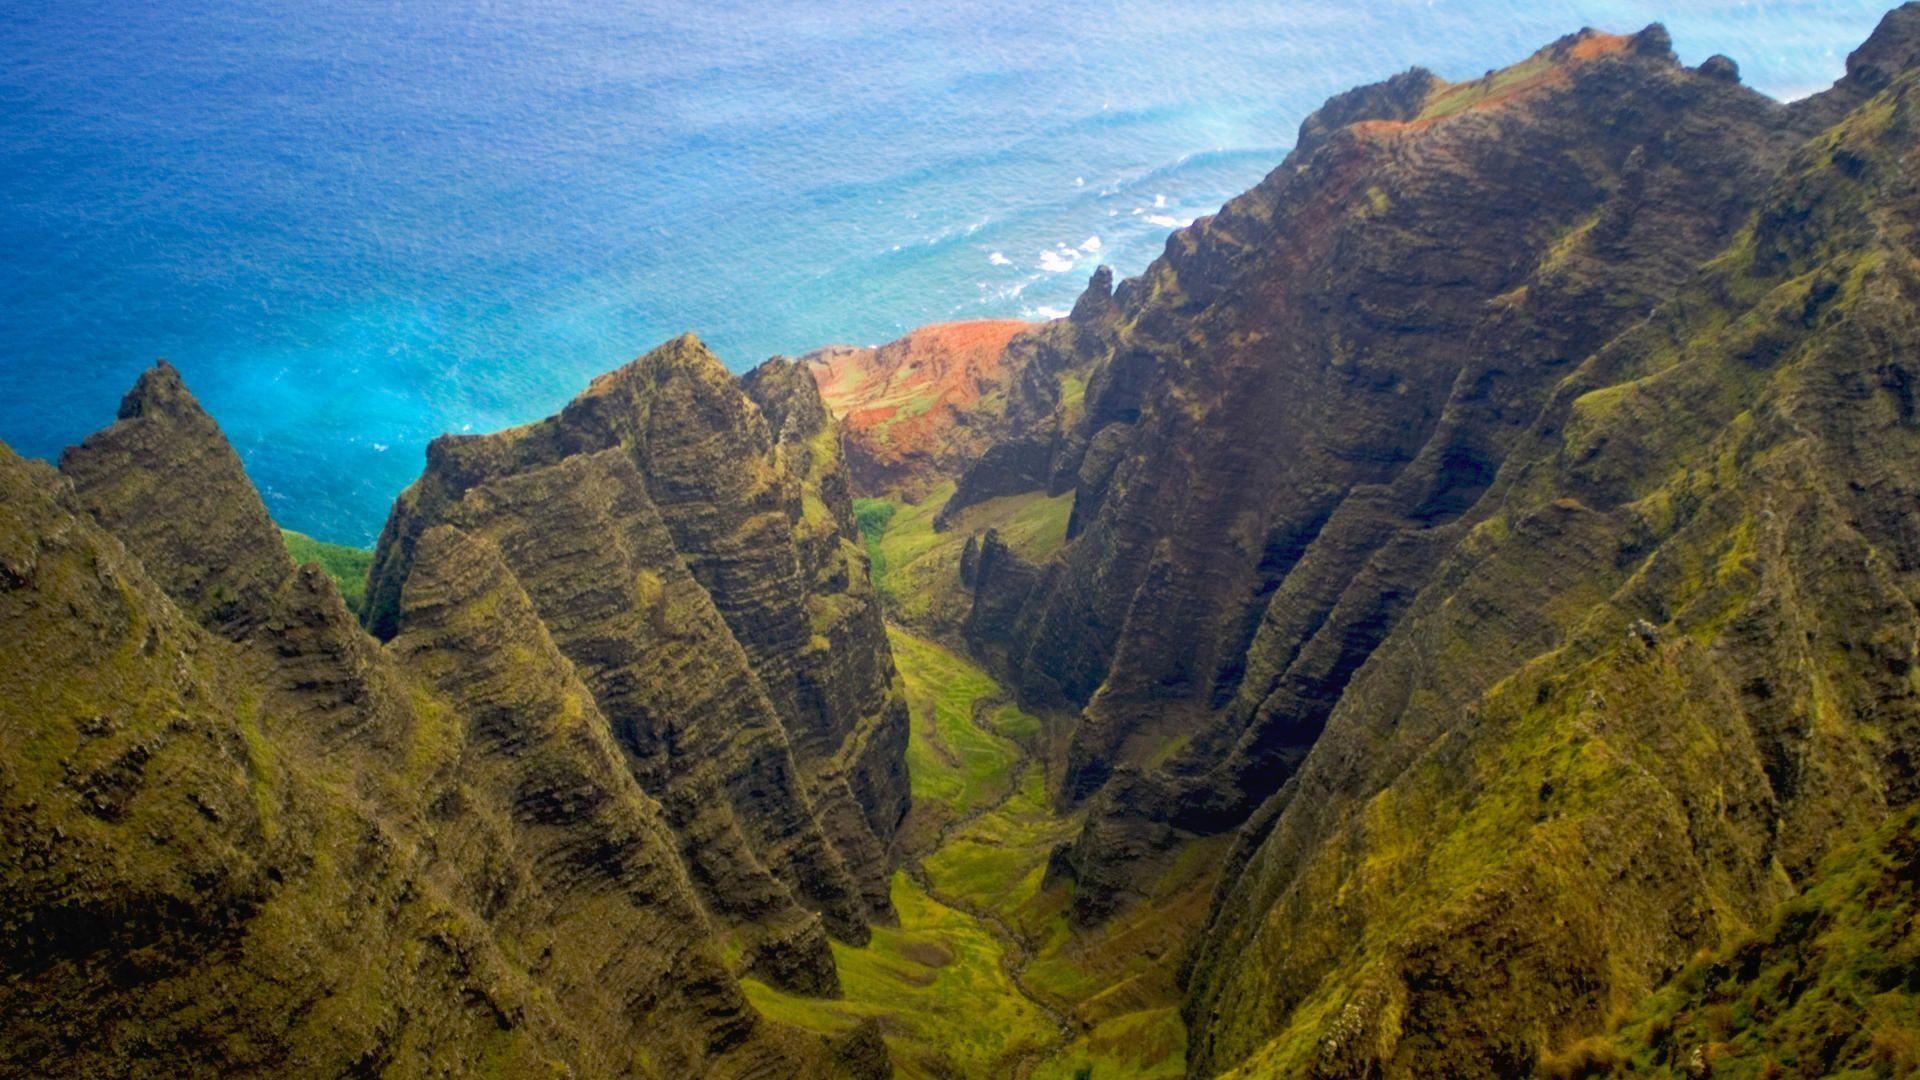 Kauai Wallpapers Wallpaper Cave